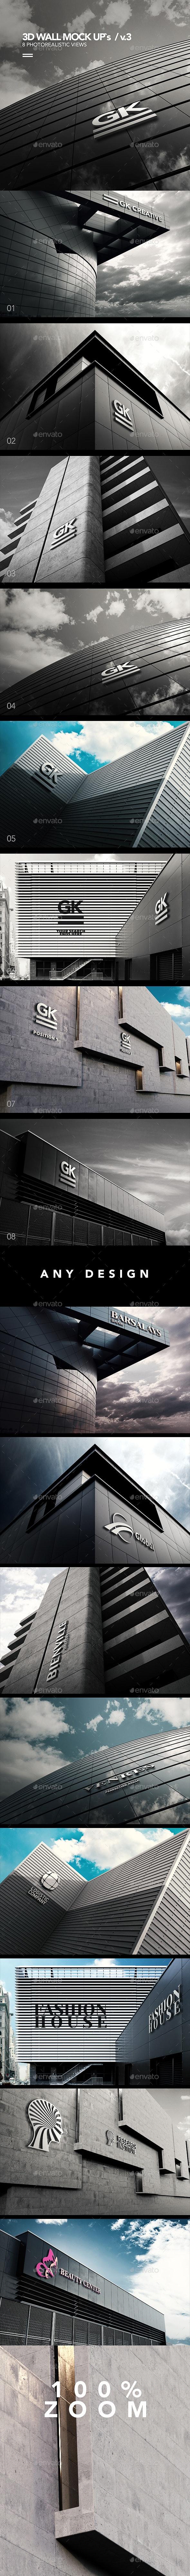 3D Logo Signage Wall Mock Up / v.3 - Logo Product Mock-Ups